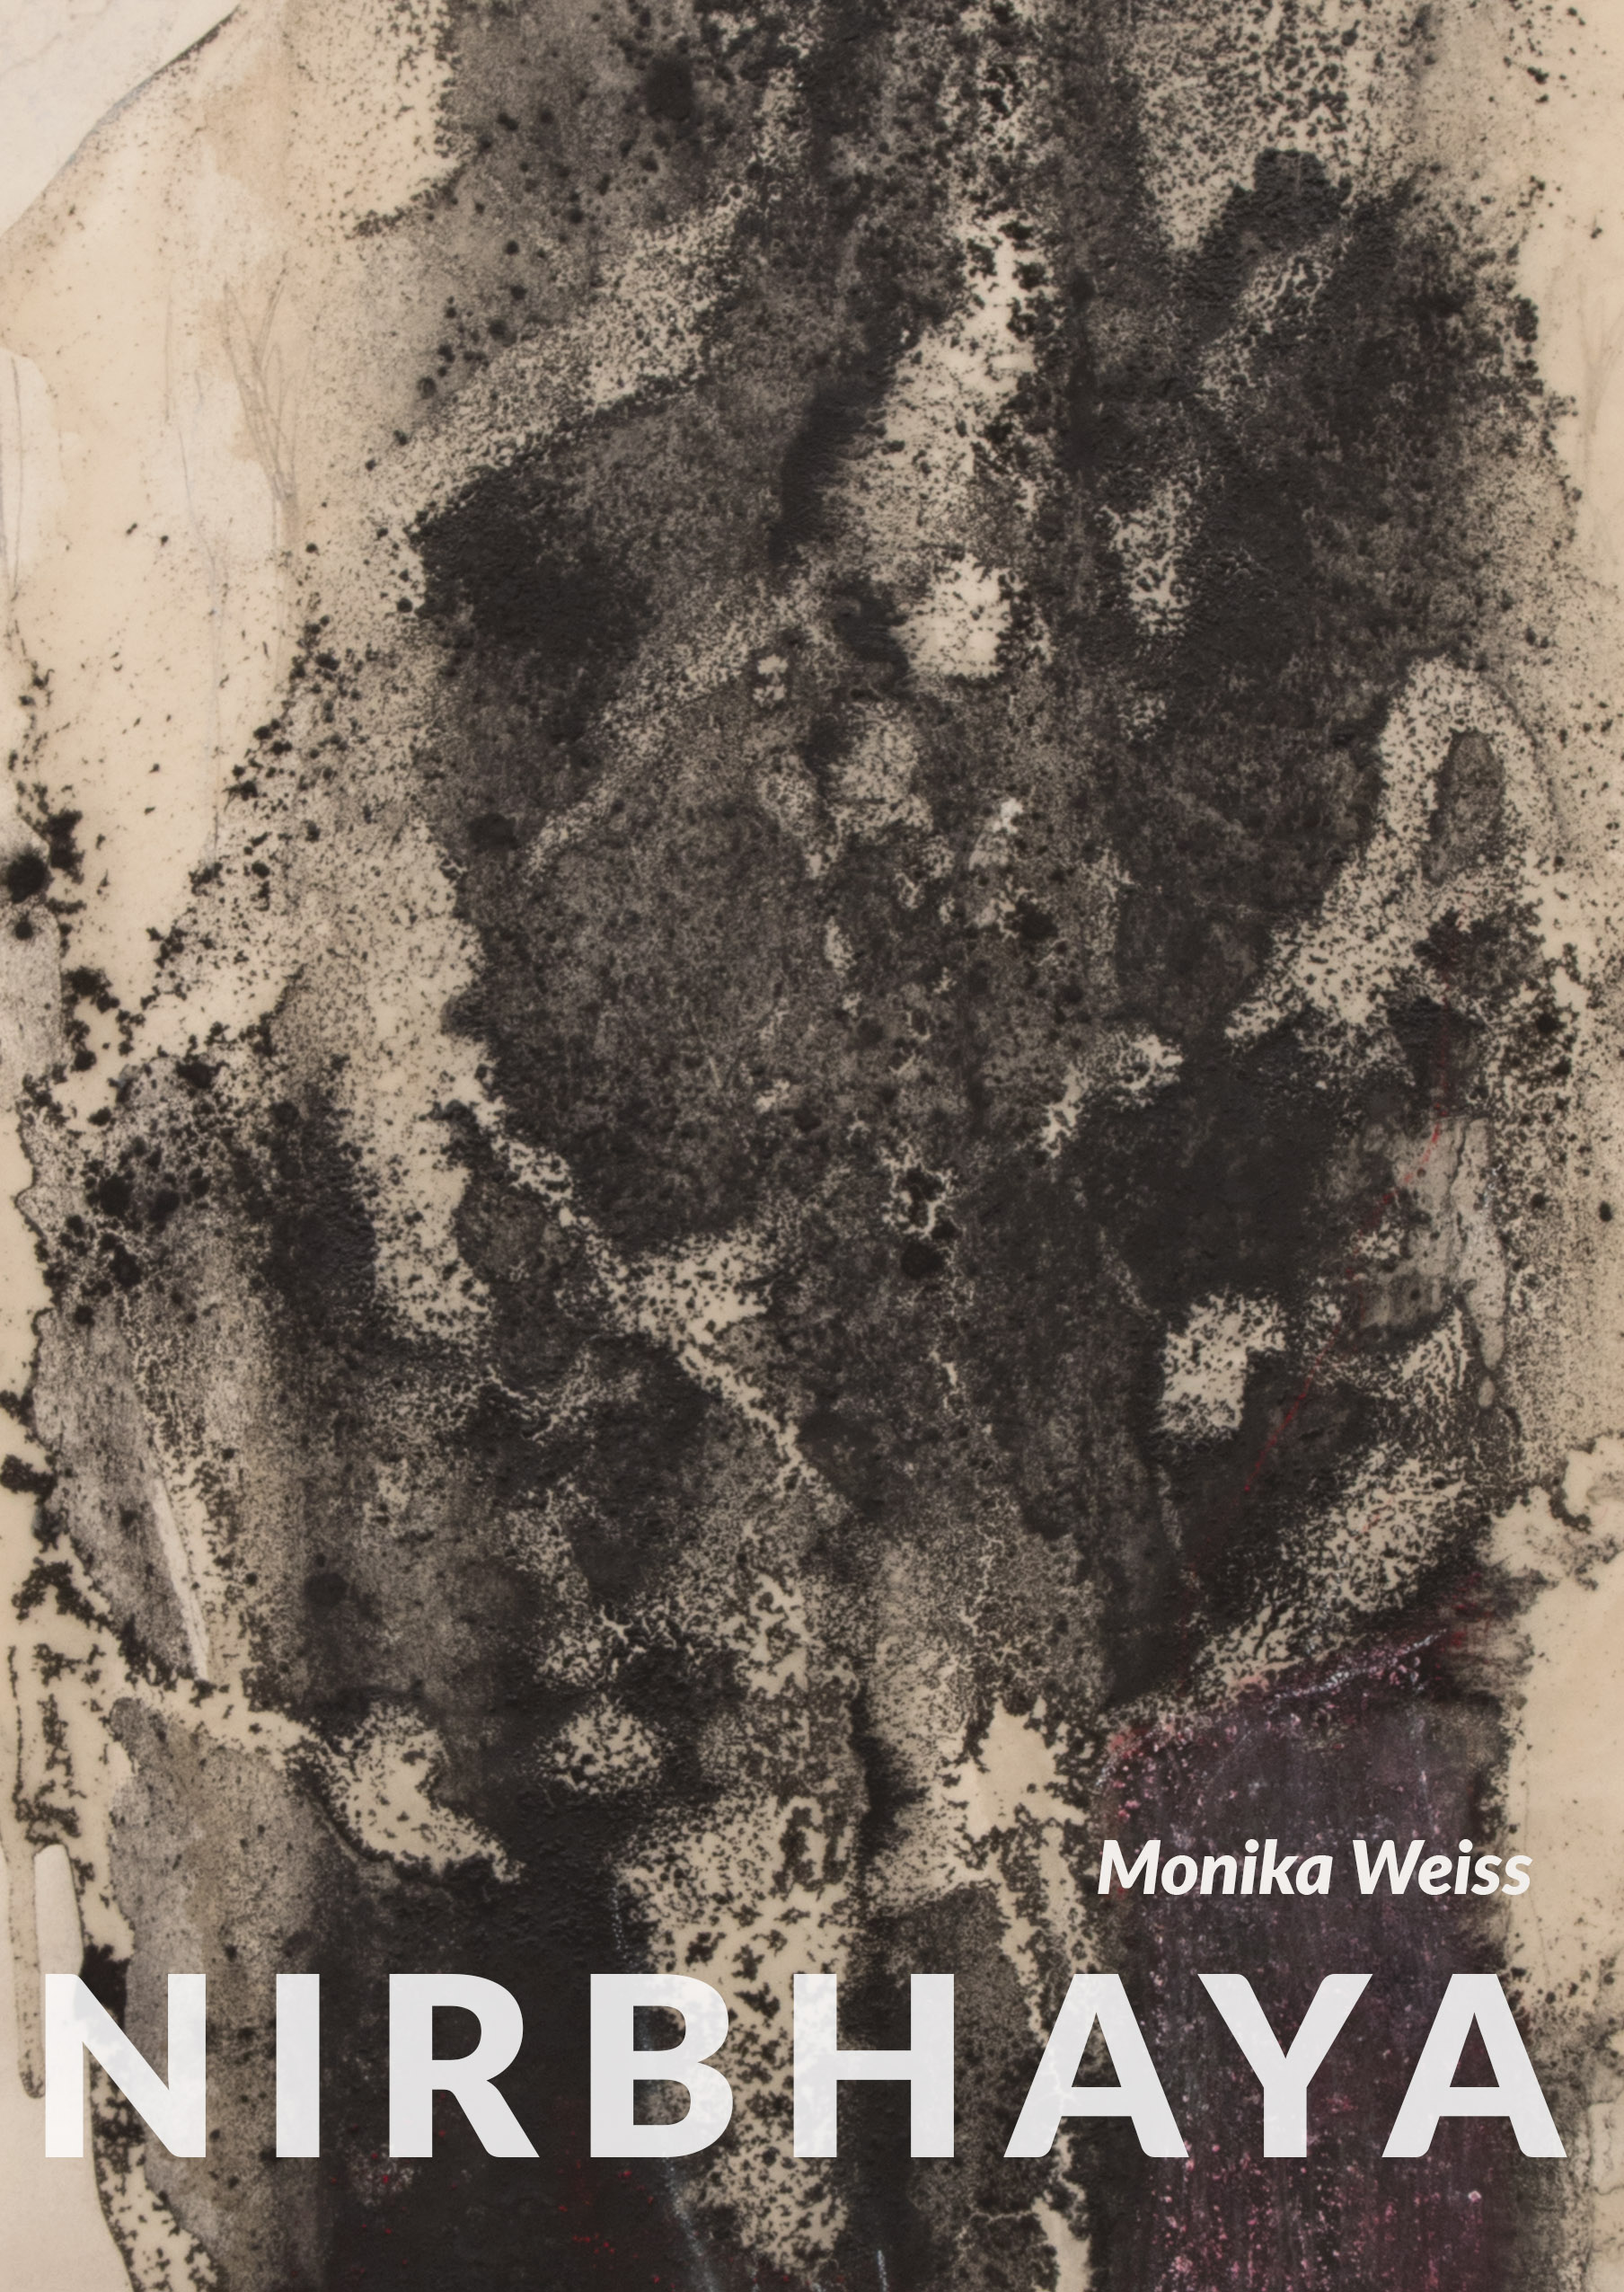 Monika Weiss Metamorphosis | Nirbhaya, 2021